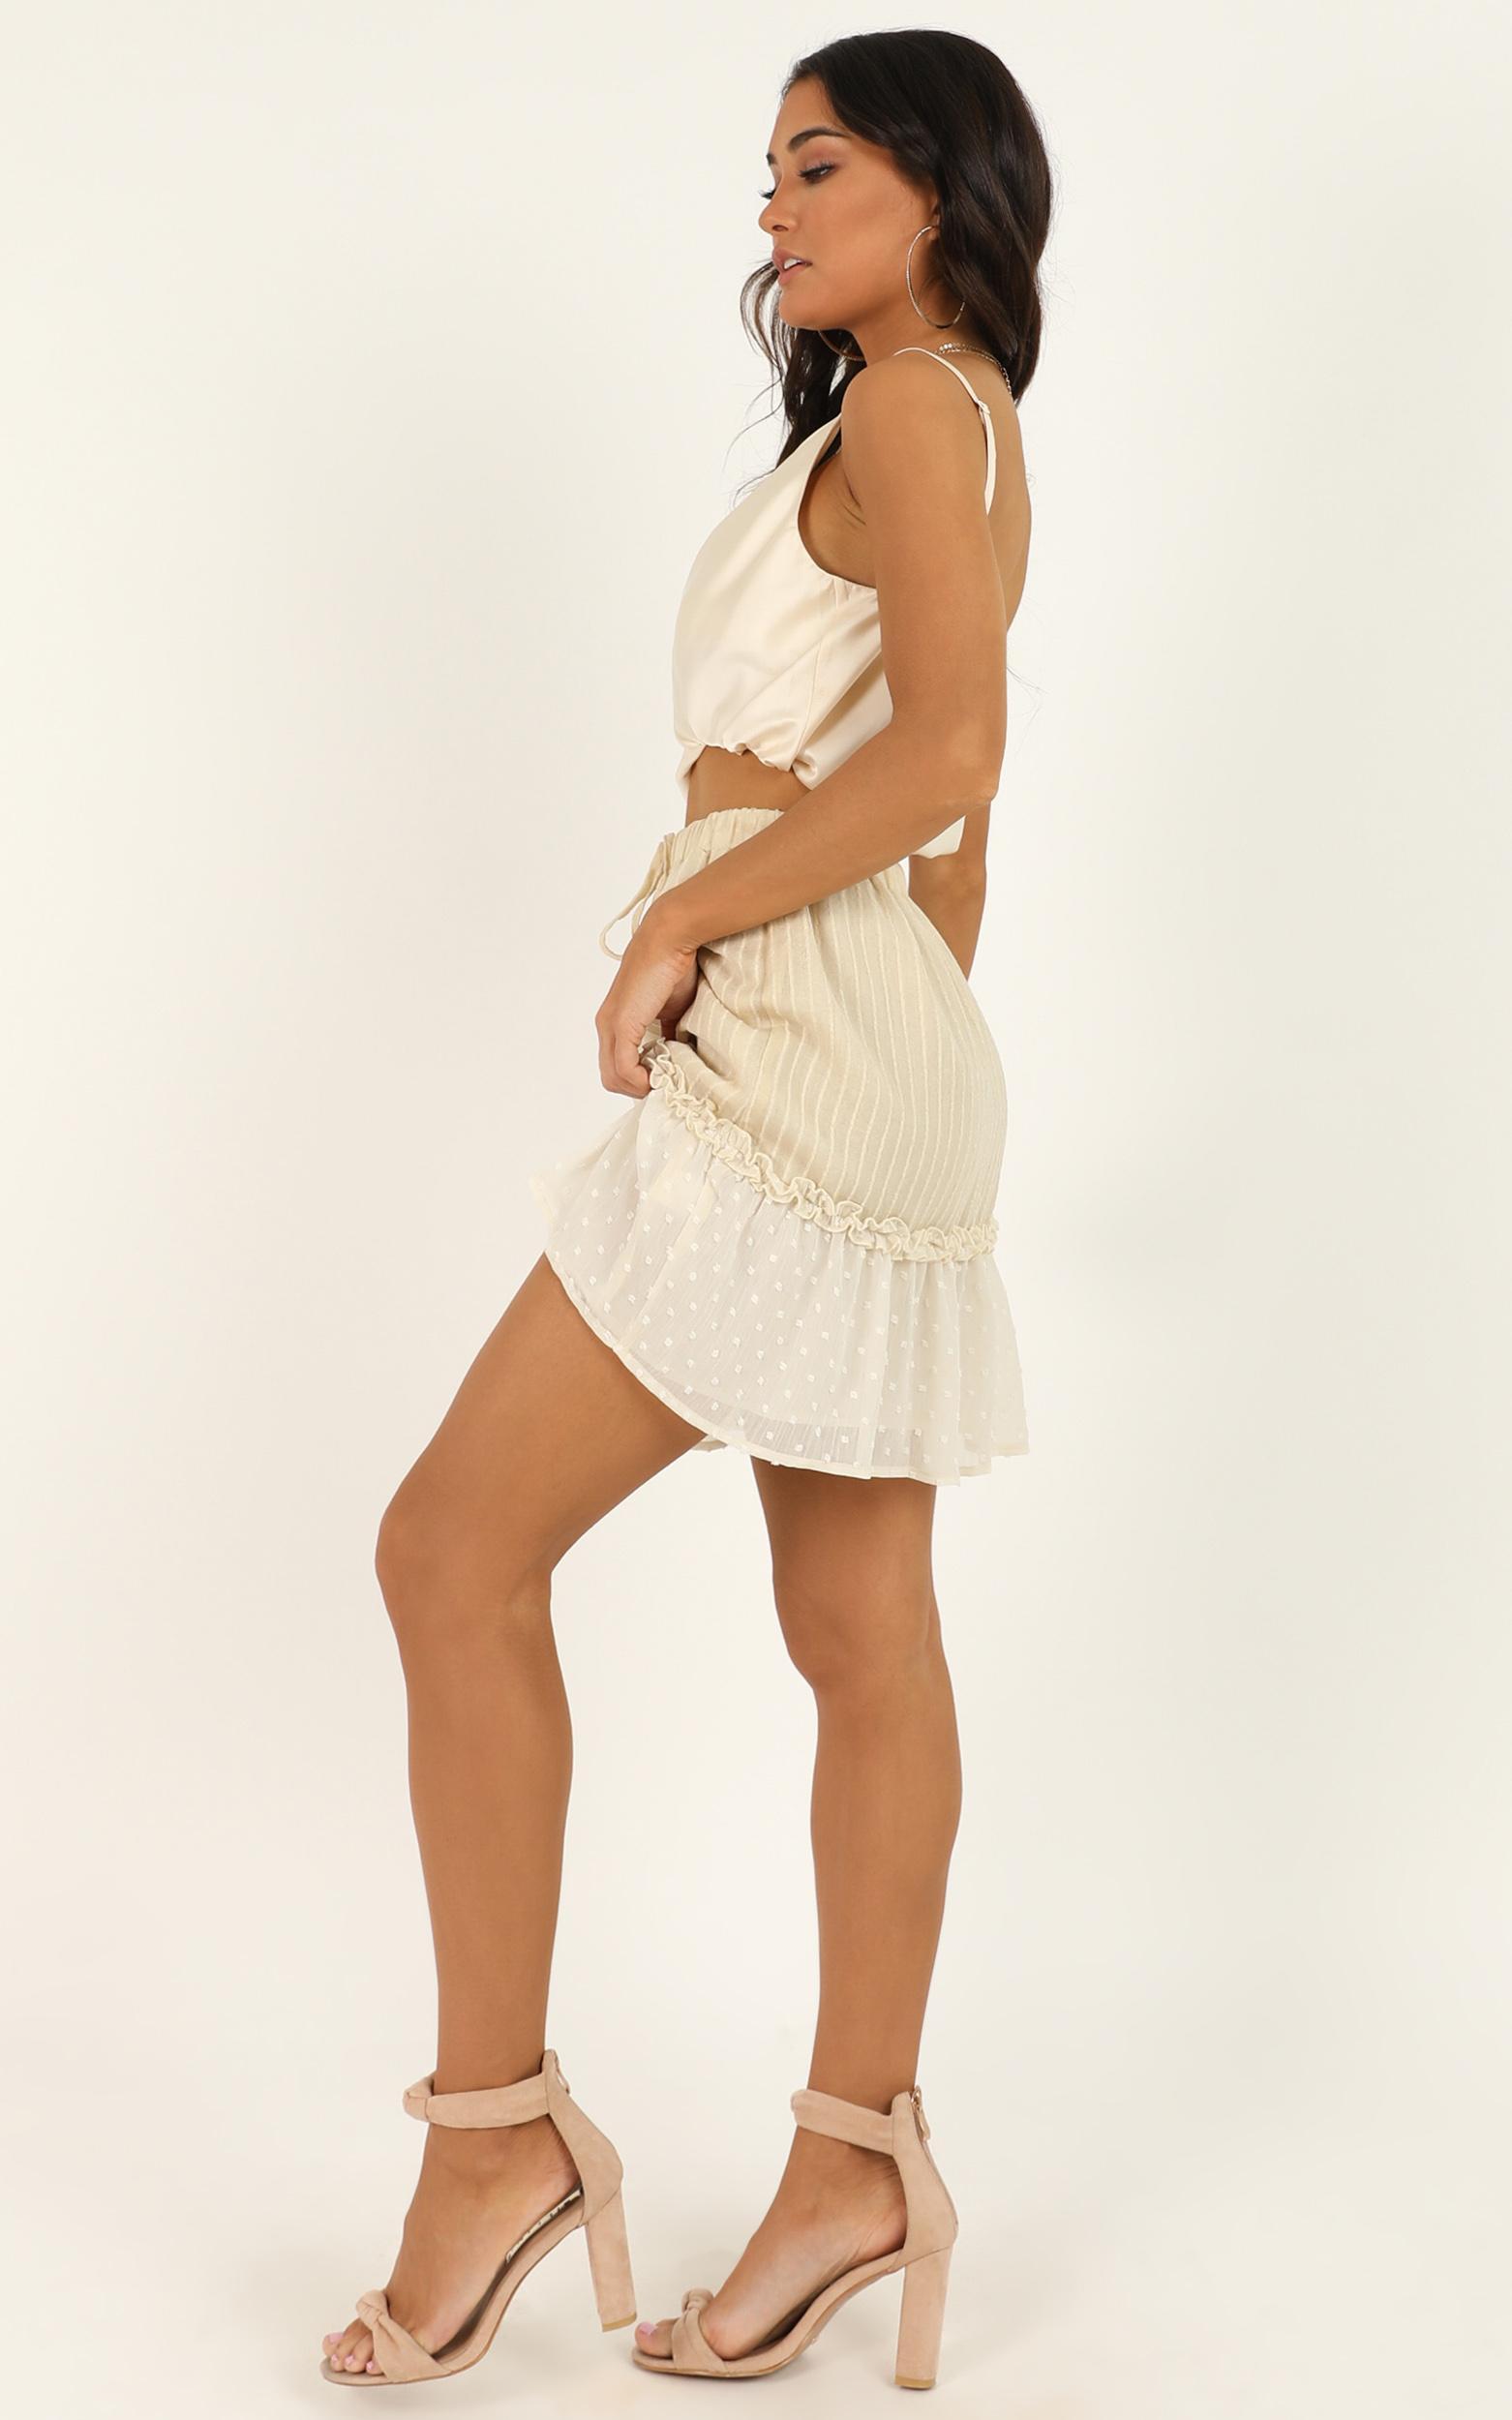 Open Options Skirt in cream - 16 (XXL), Cream, hi-res image number null